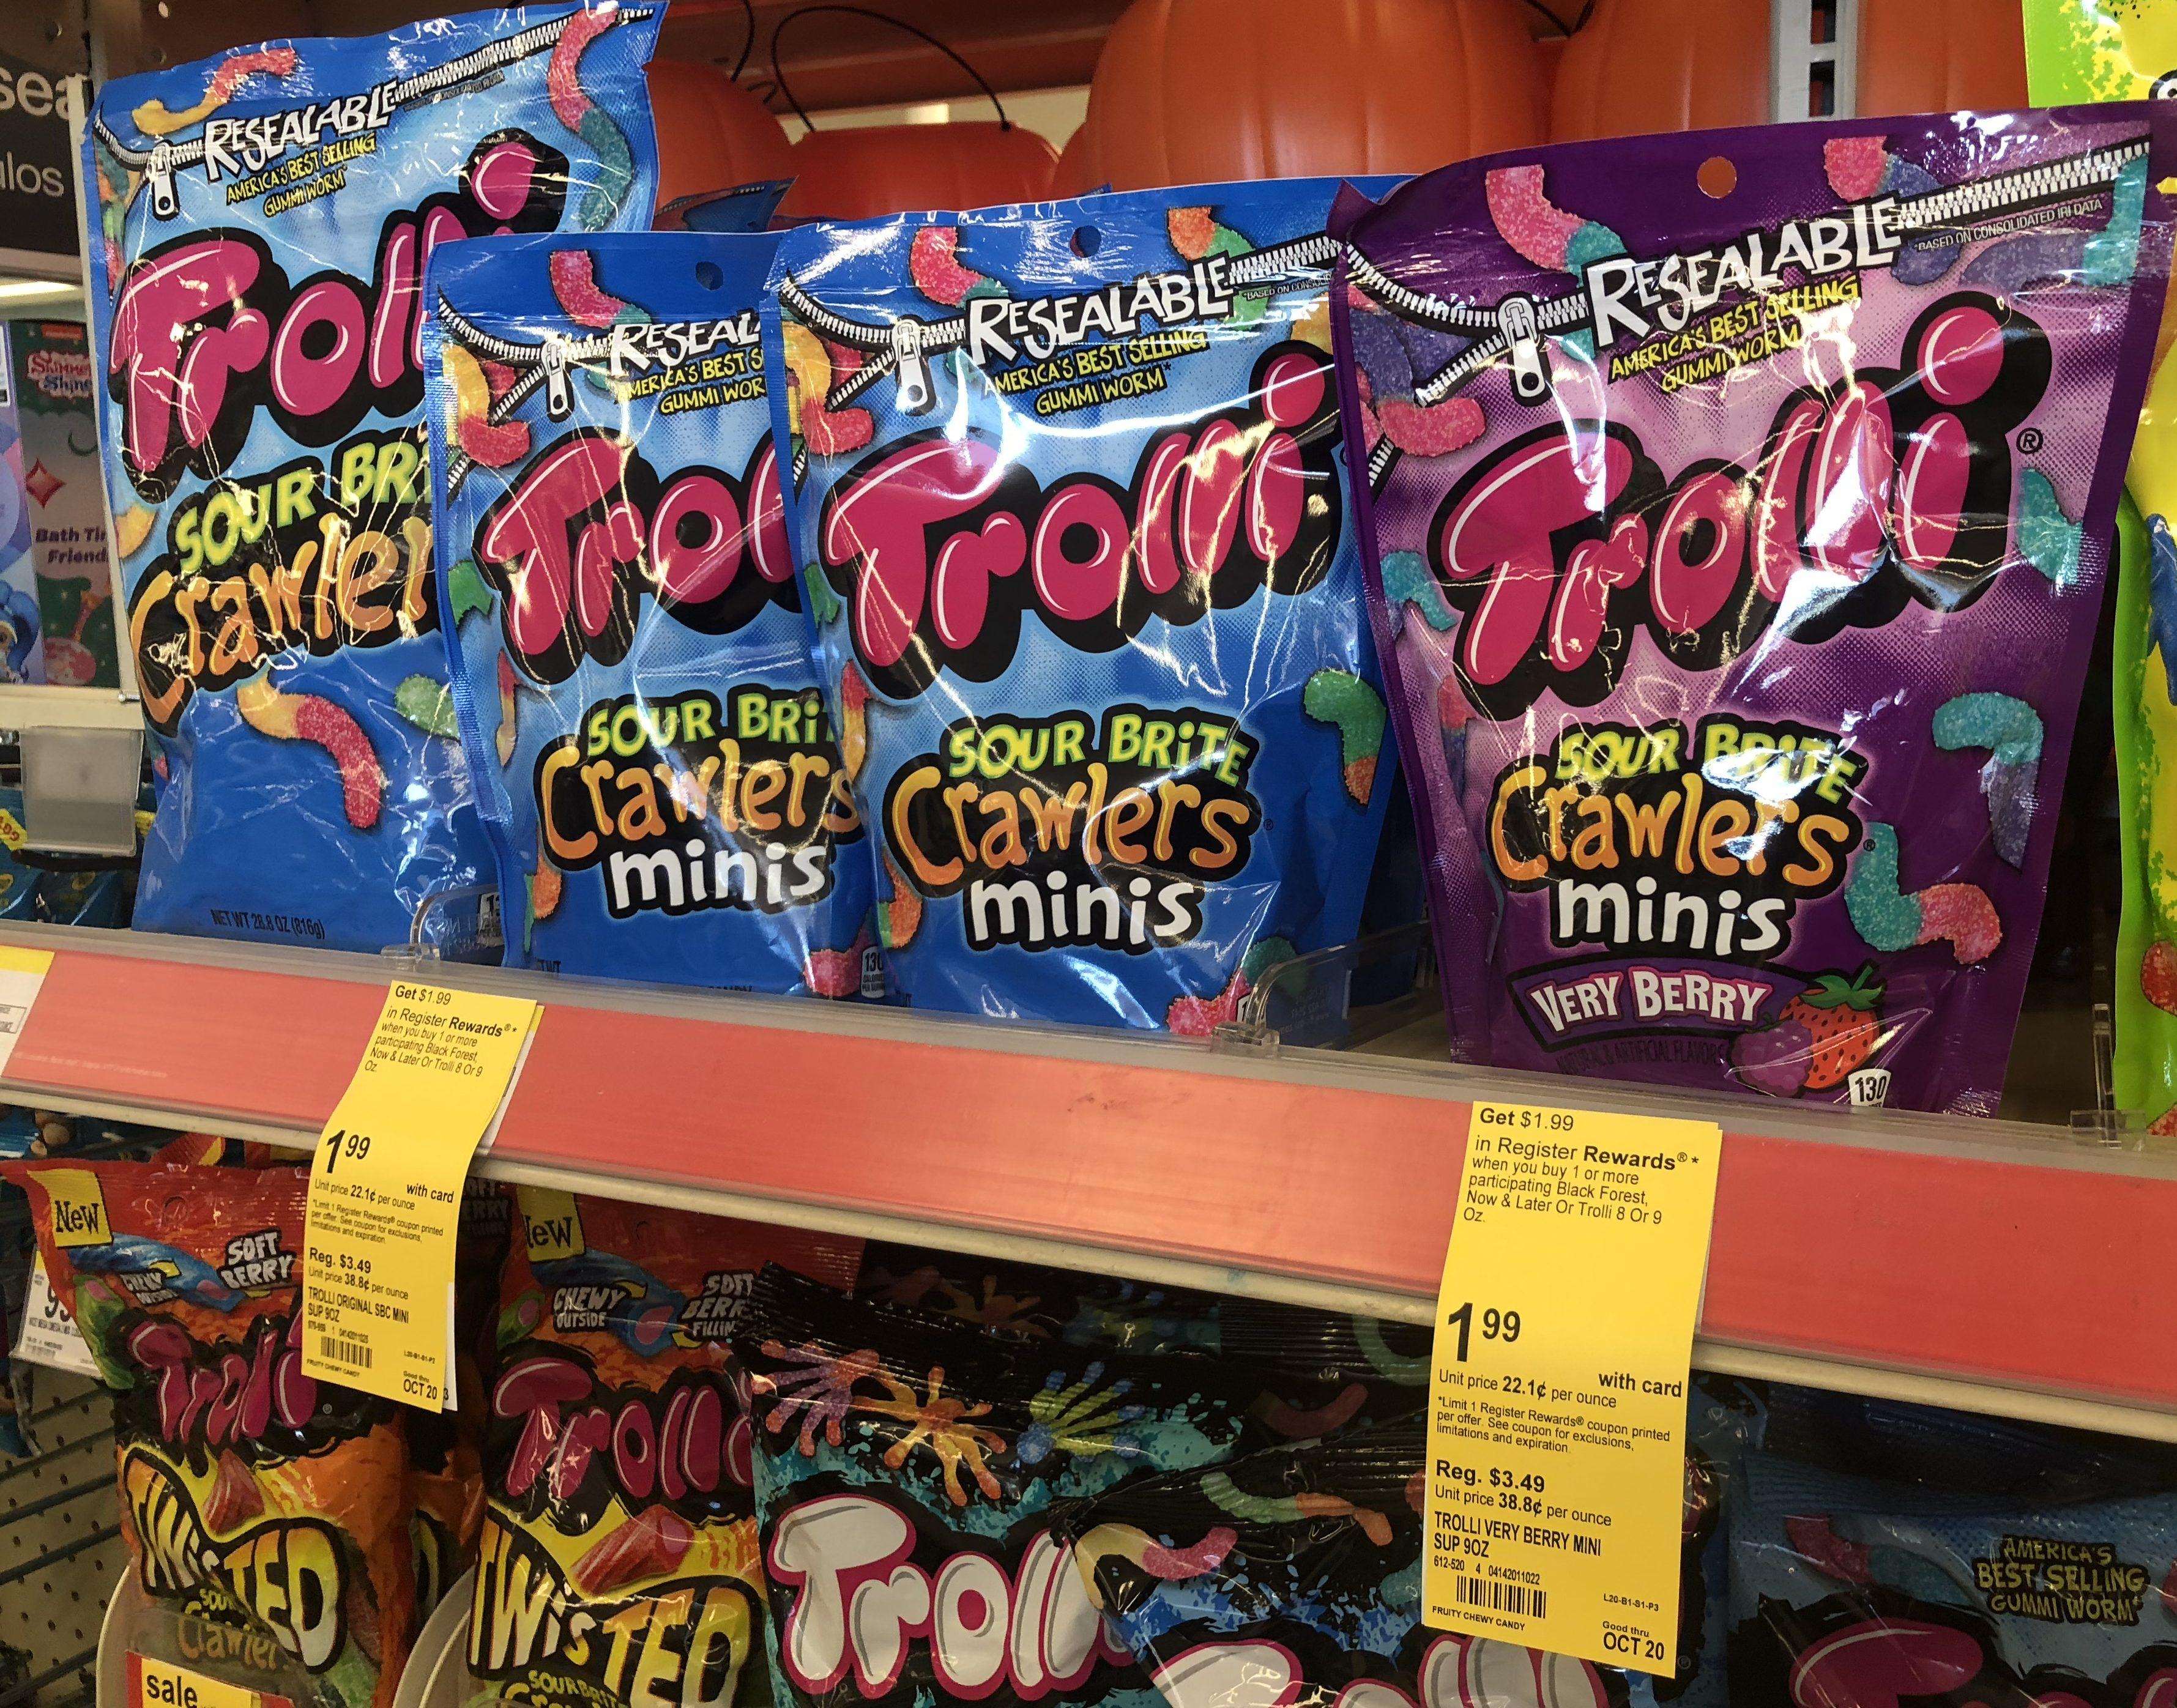 target & walgreens deals, coupons, & freebies 10-17-2018 –Trolli Candy deal at Walgreens